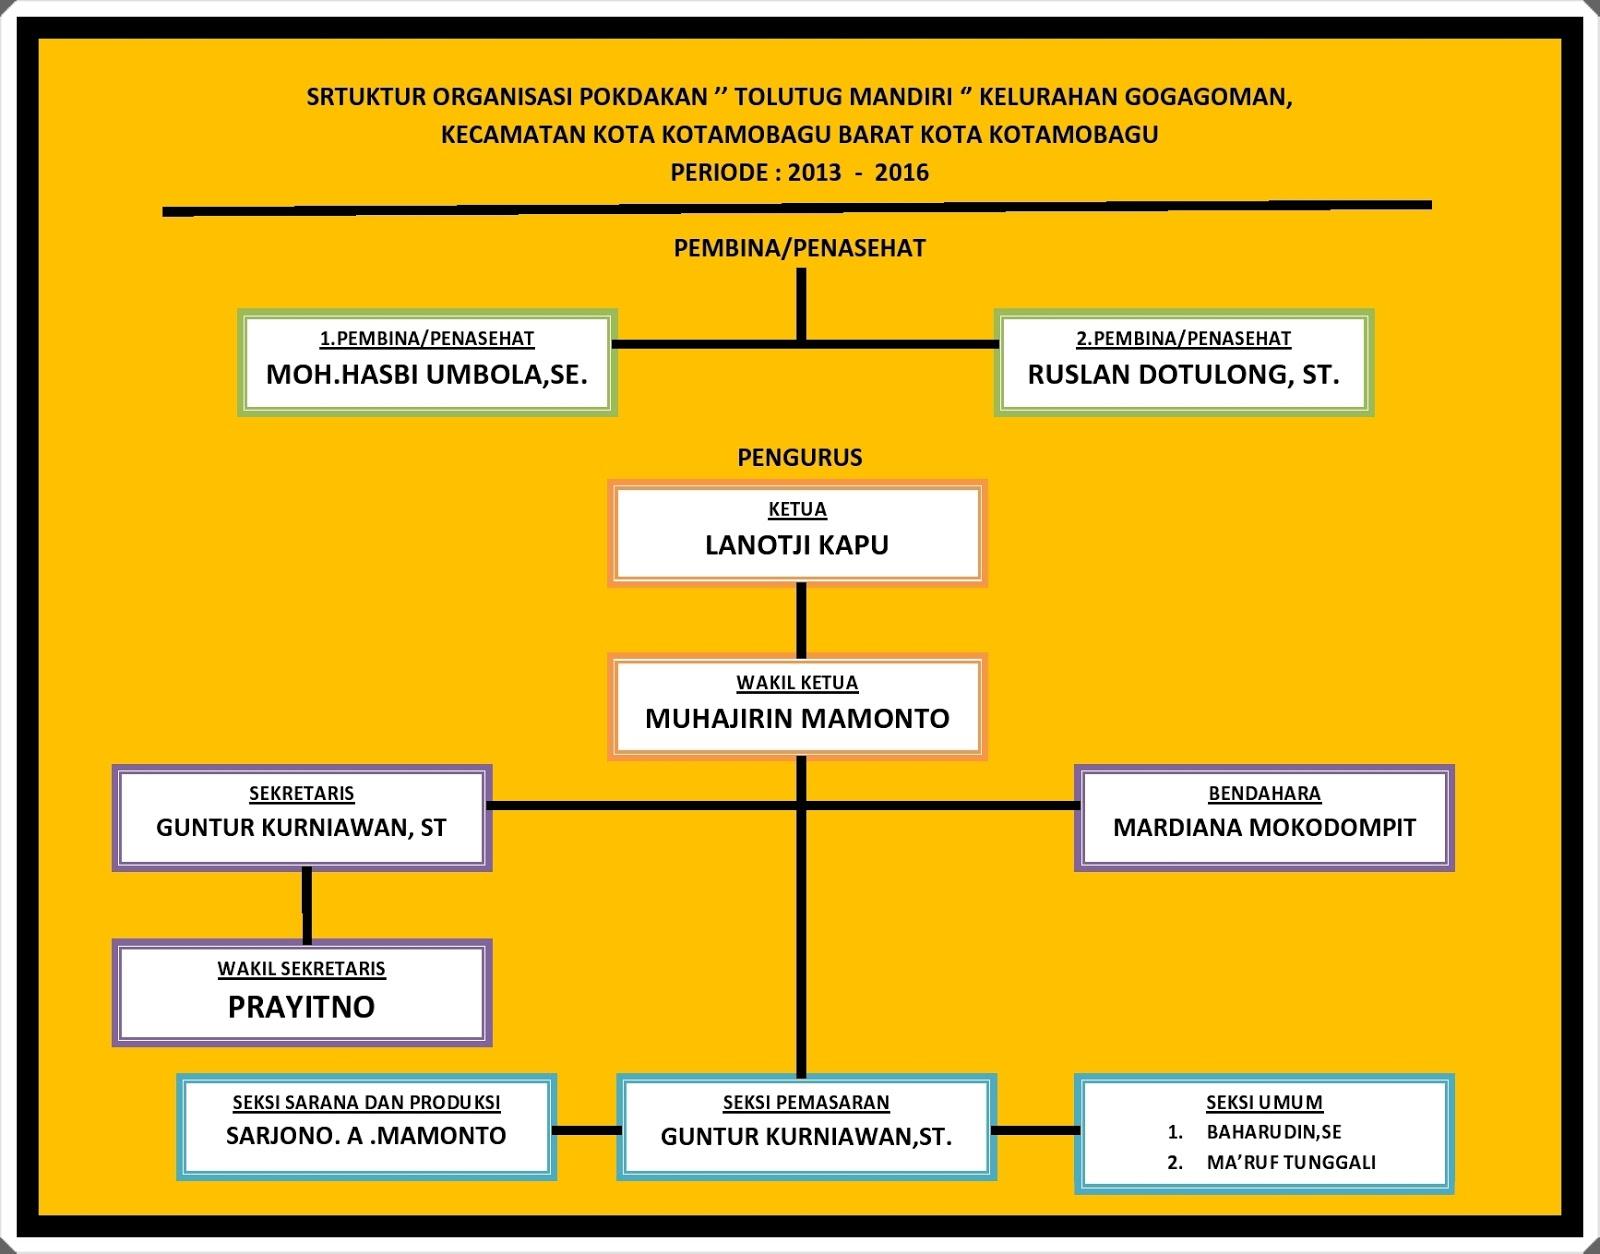 struktur organisasi perikanan pokdakan tolutug mandiri kelurahan gogagoman kota kotamobagu